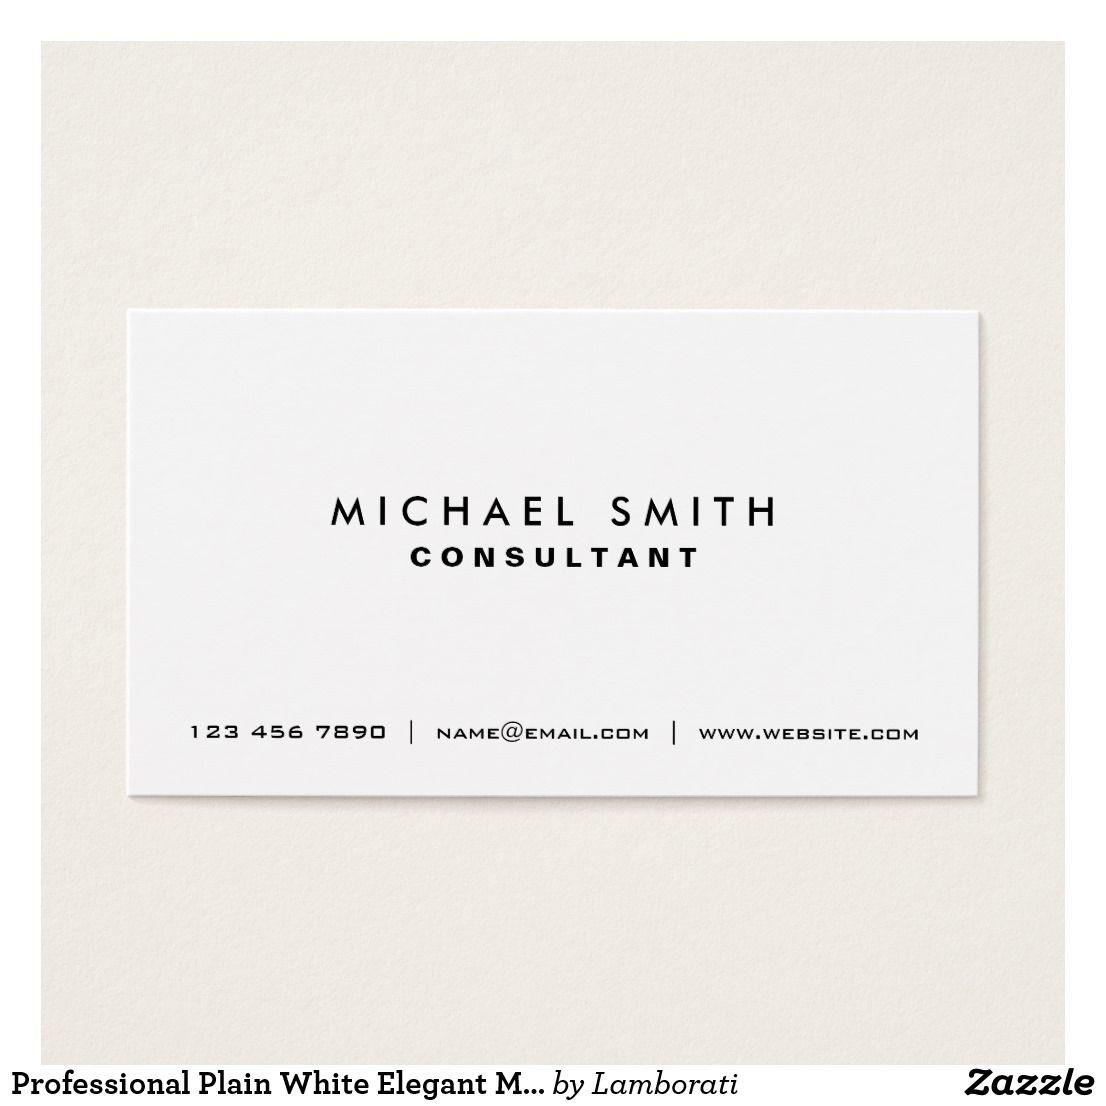 Professional Plain White Elegant Modern Simple Business Card Zazzle Com Simple Business Cards Modern Business Cards Elegant Business Cards